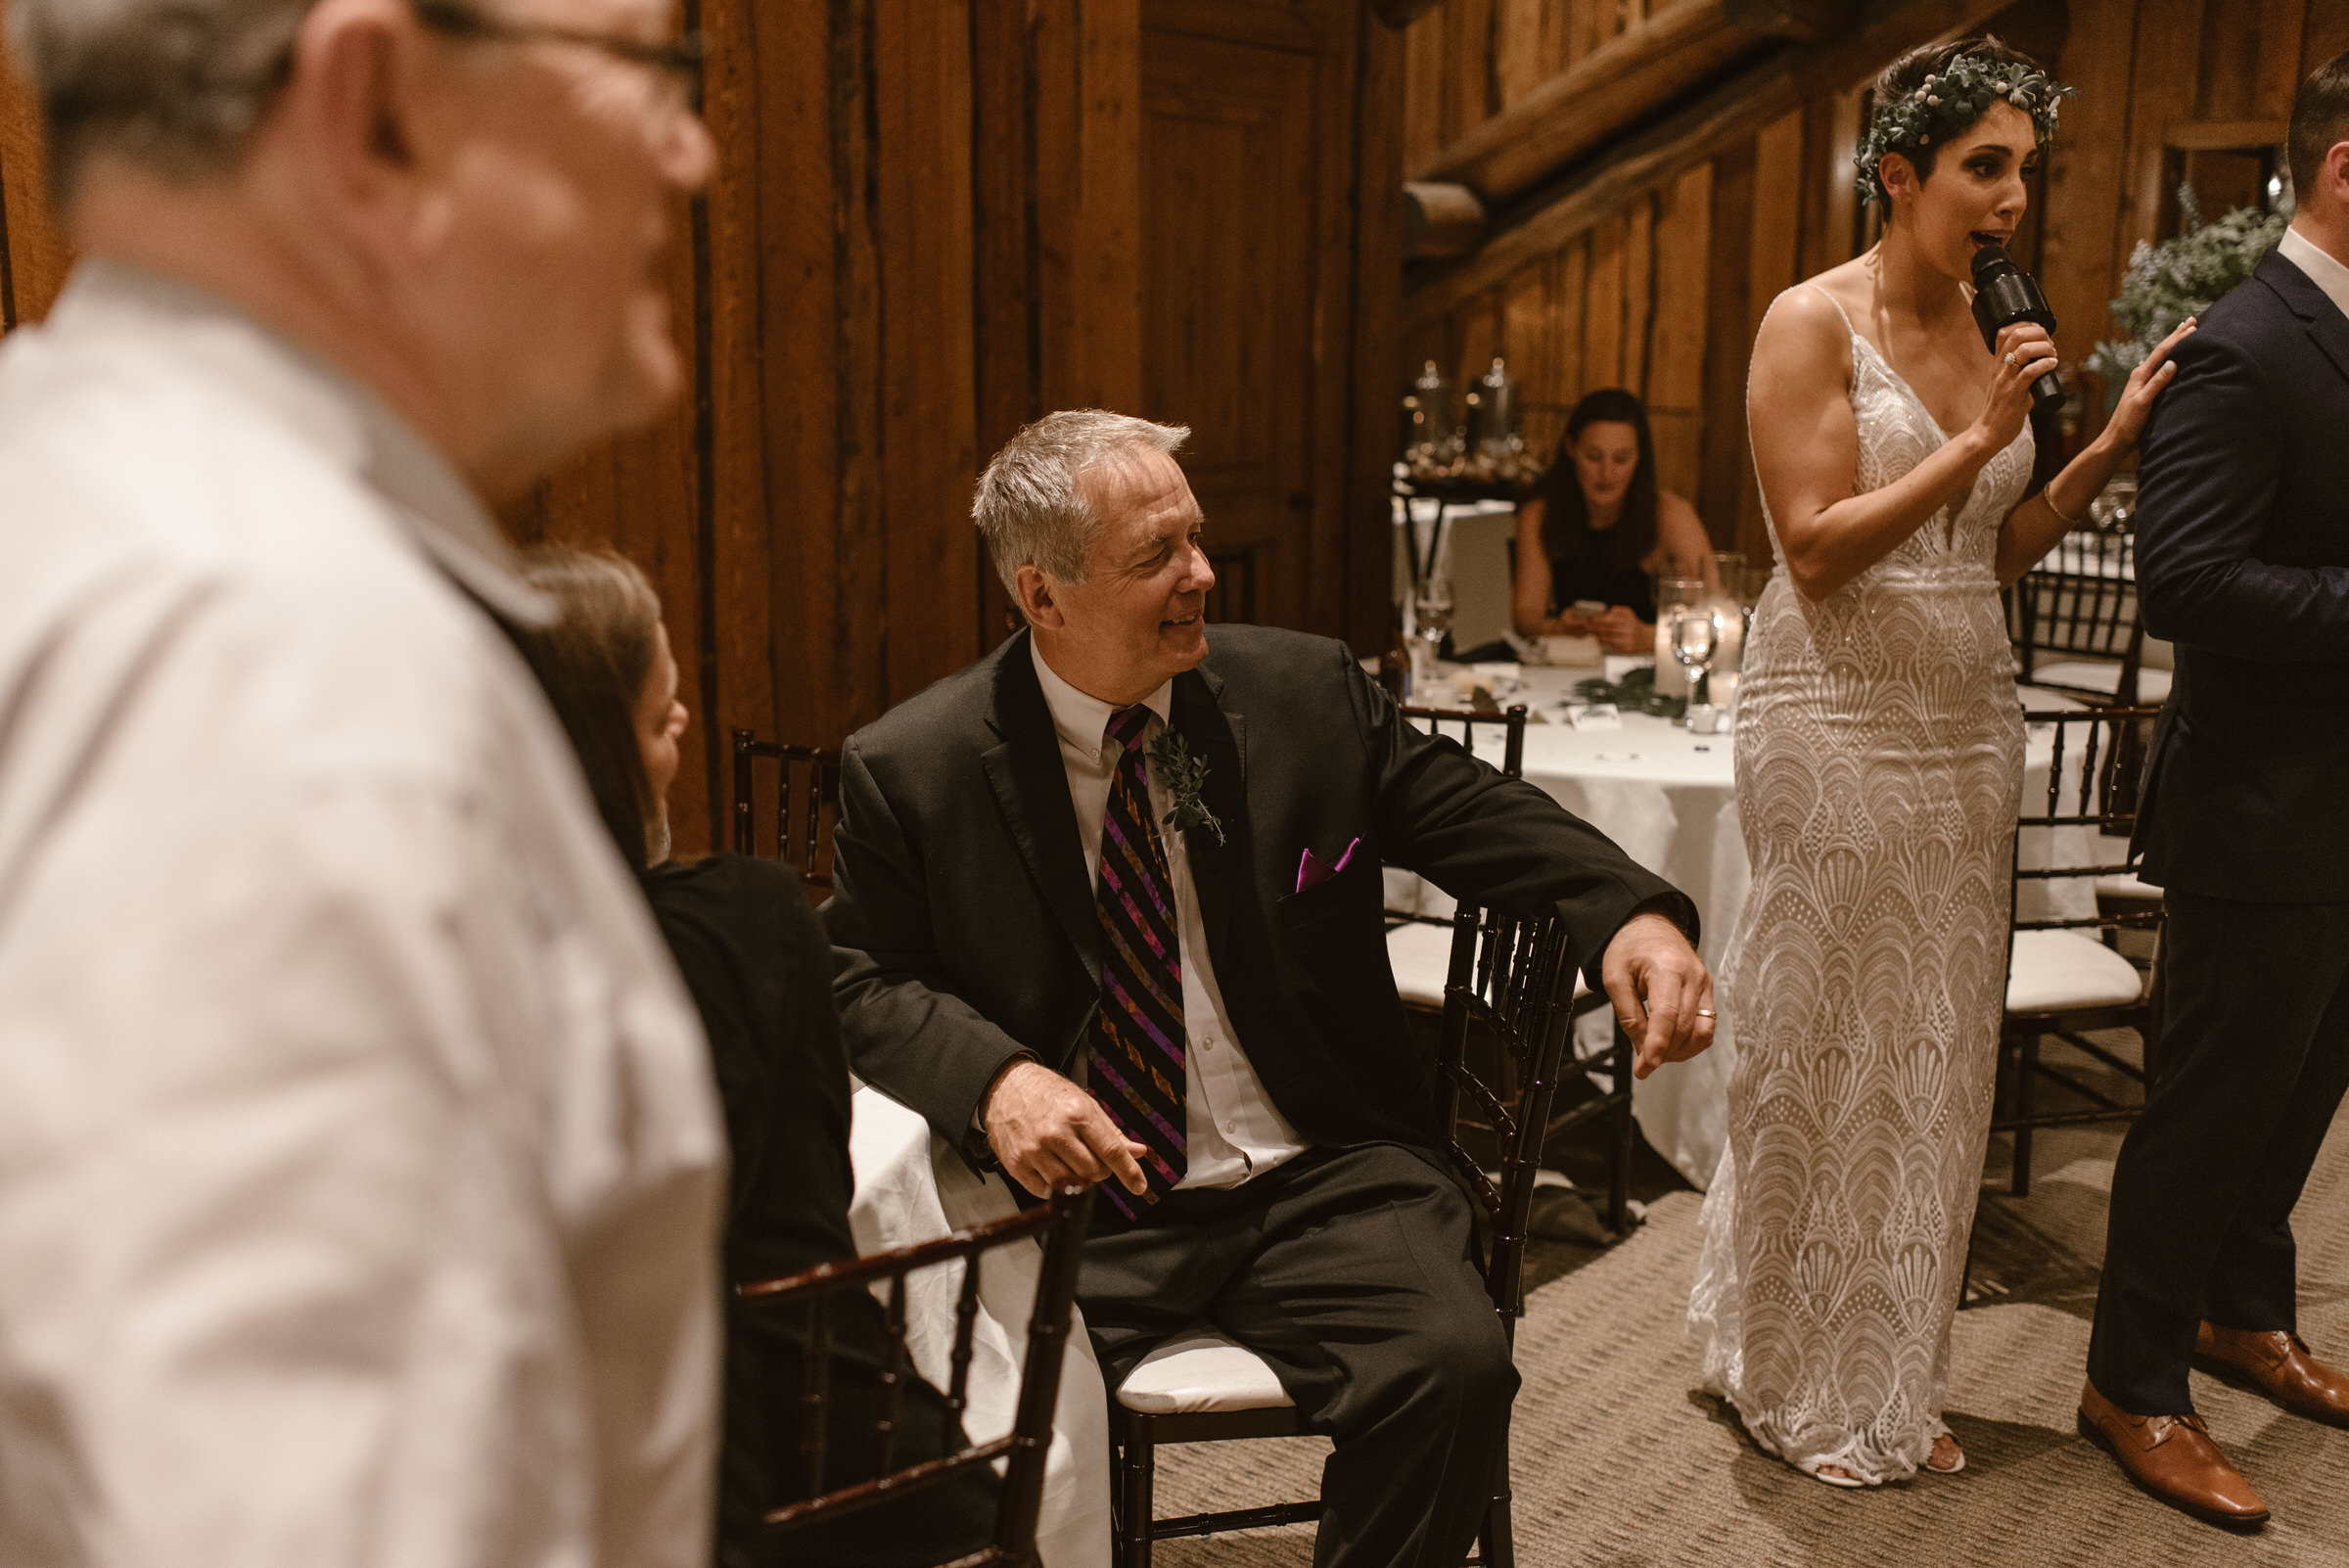 Wilderness-Ridge-Lincoln-Nebraska-Wedding-Kaylie-Sirek-Photography-119.jpg